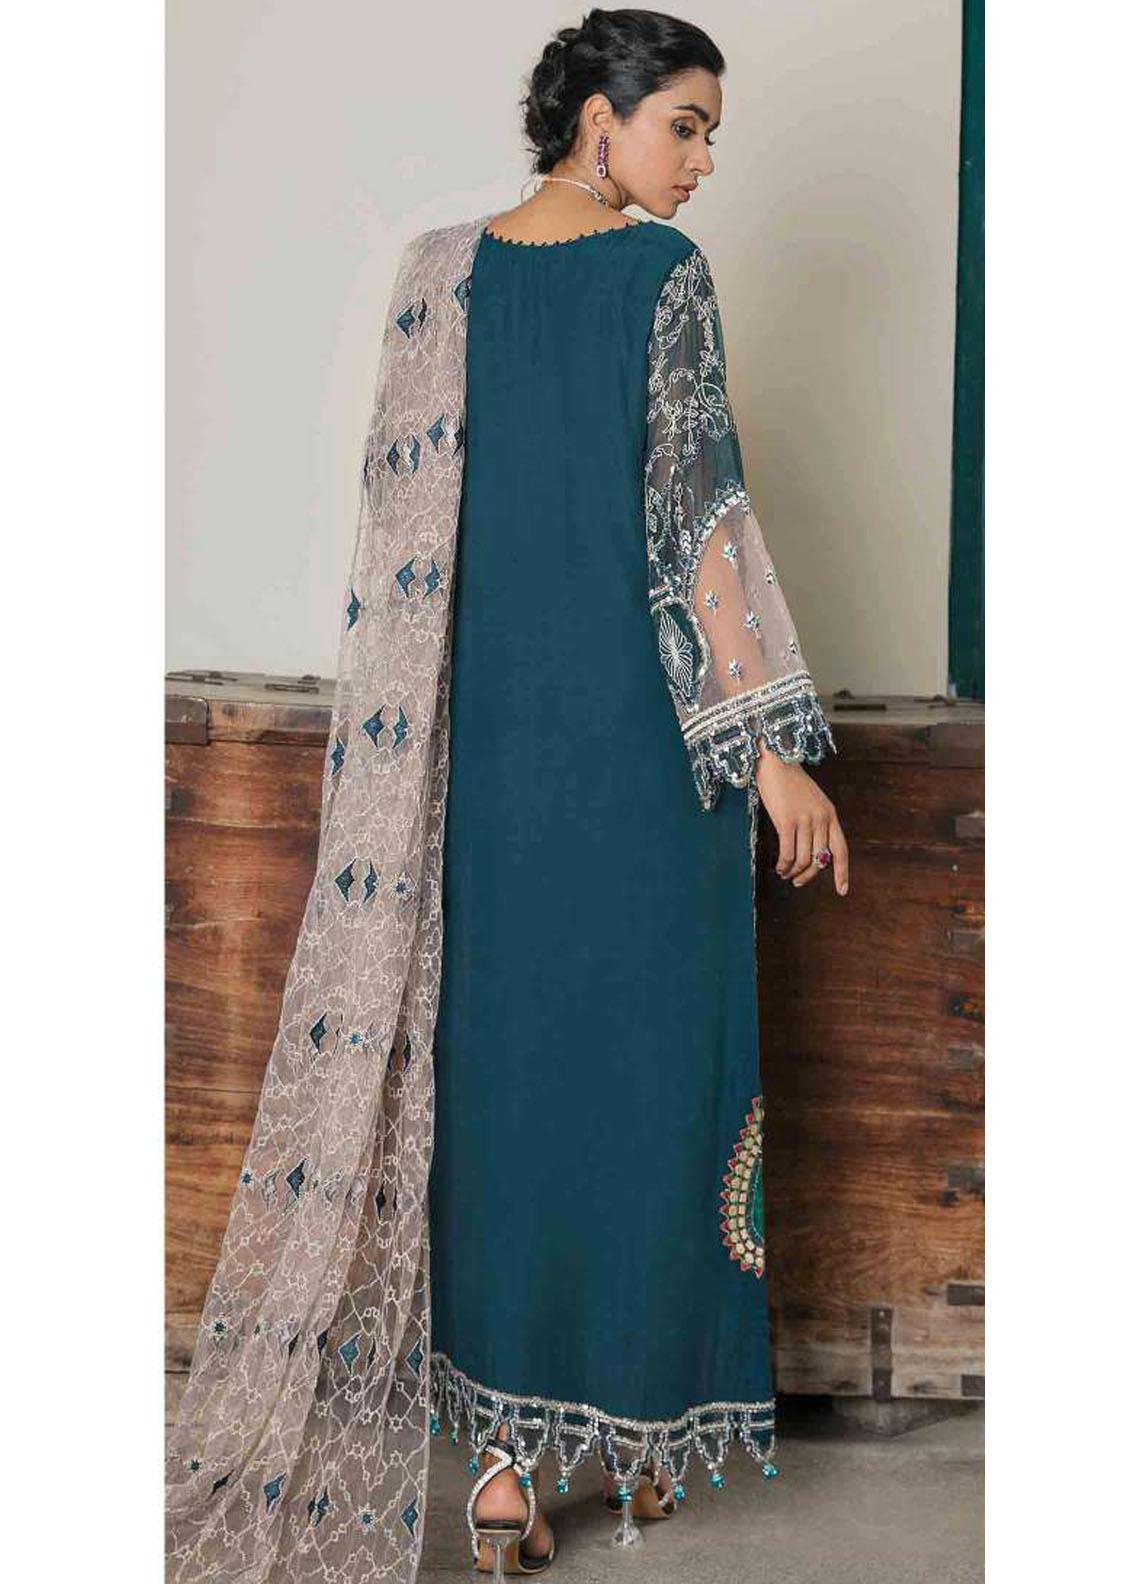 Suraj Garh by Imrozia Premium Embroidered Chiffon Suit Unstitched 3 Piece I-142 ZOHRA – Wedding Collection